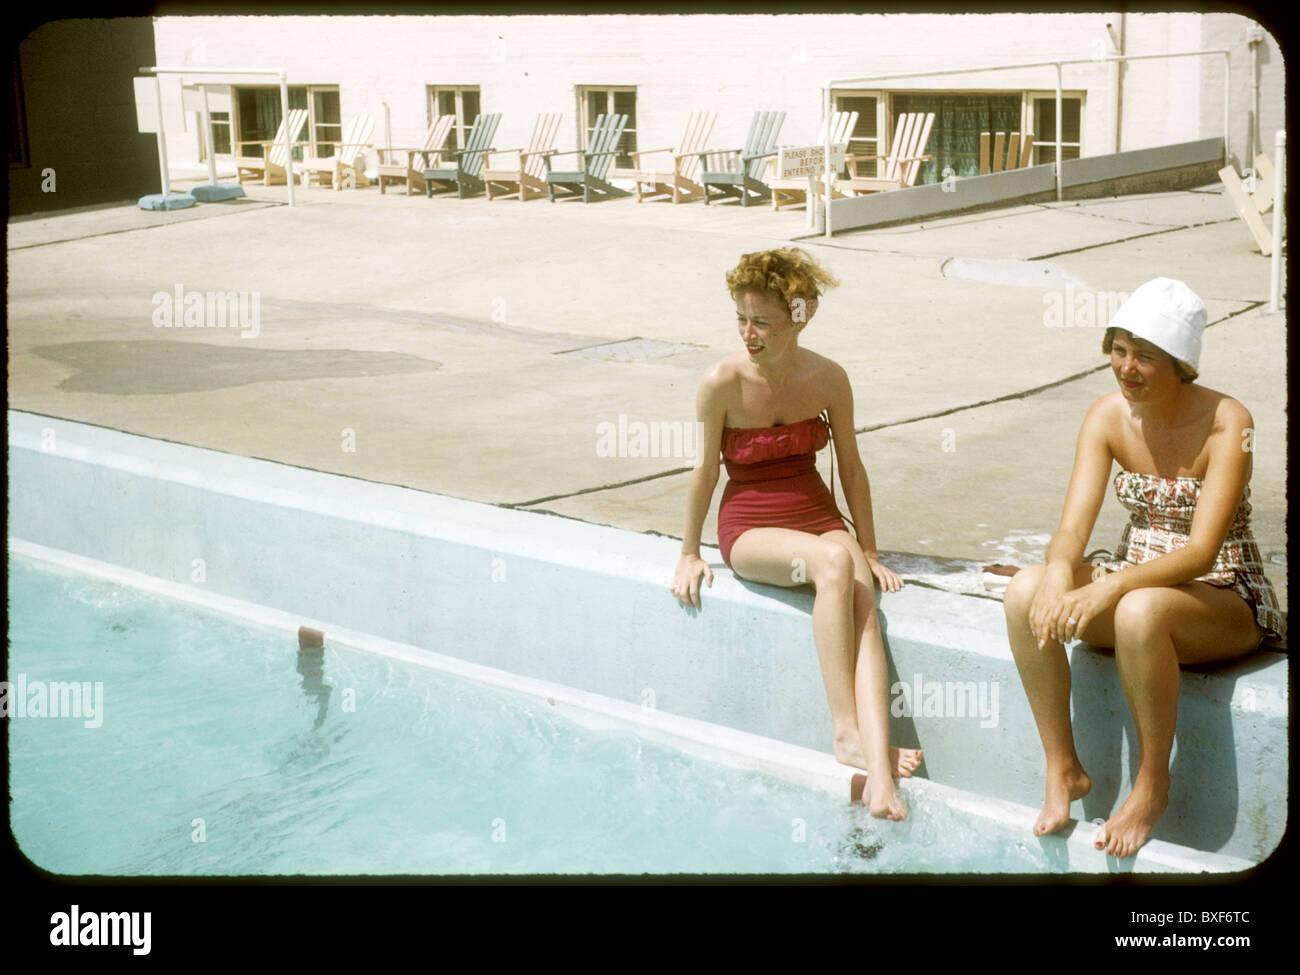 Zwei hübsche Frauen sitzen am Rand des Motel Hotel Swmimming Pool Mode Badeanzug Badeanzug 1959s 1950s modische Stockbild